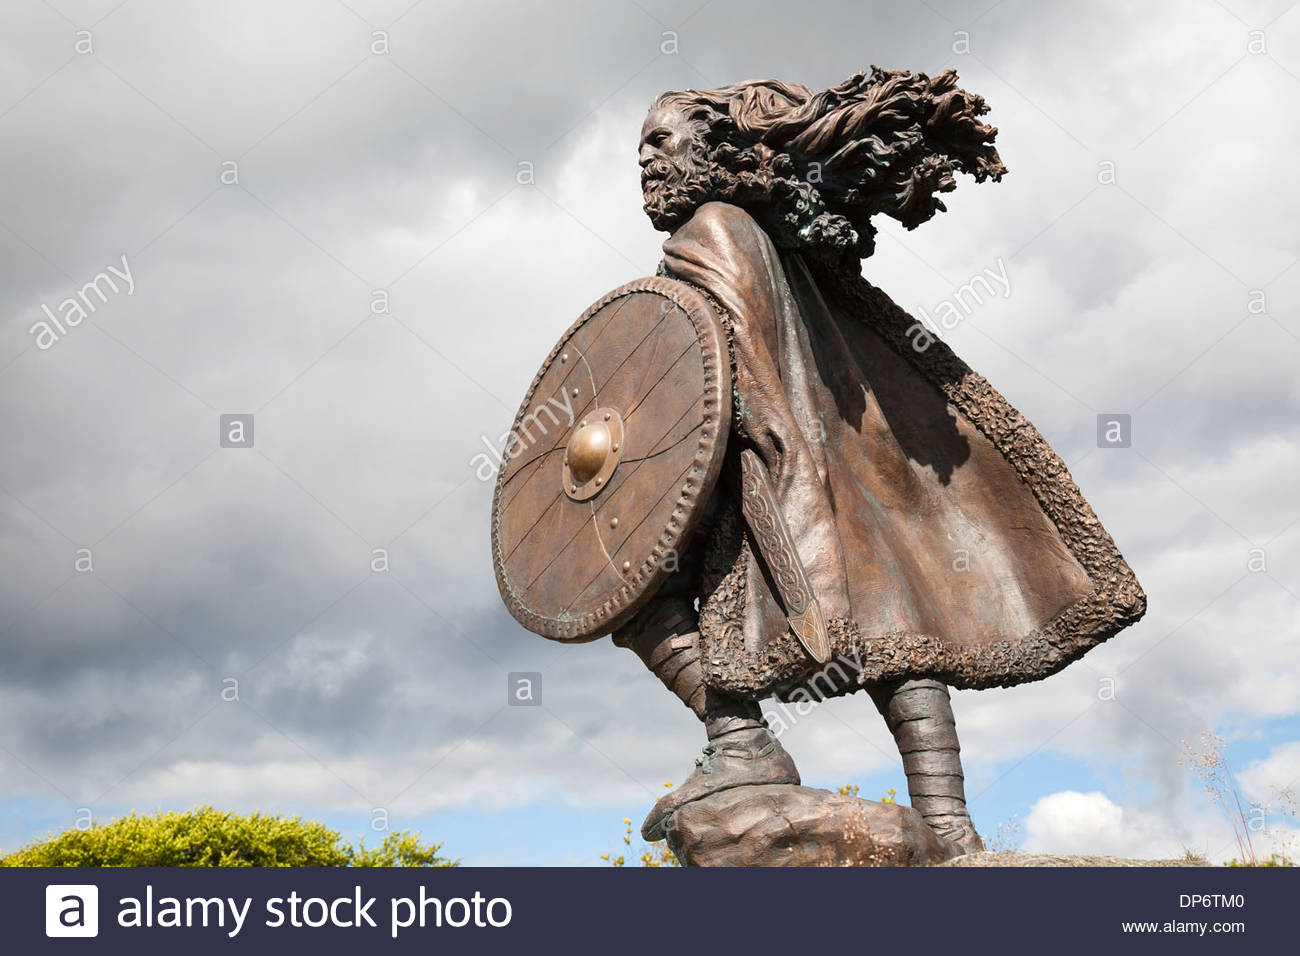 statue of king harald harfagre,haugesund town,norway,europe - Stock Image